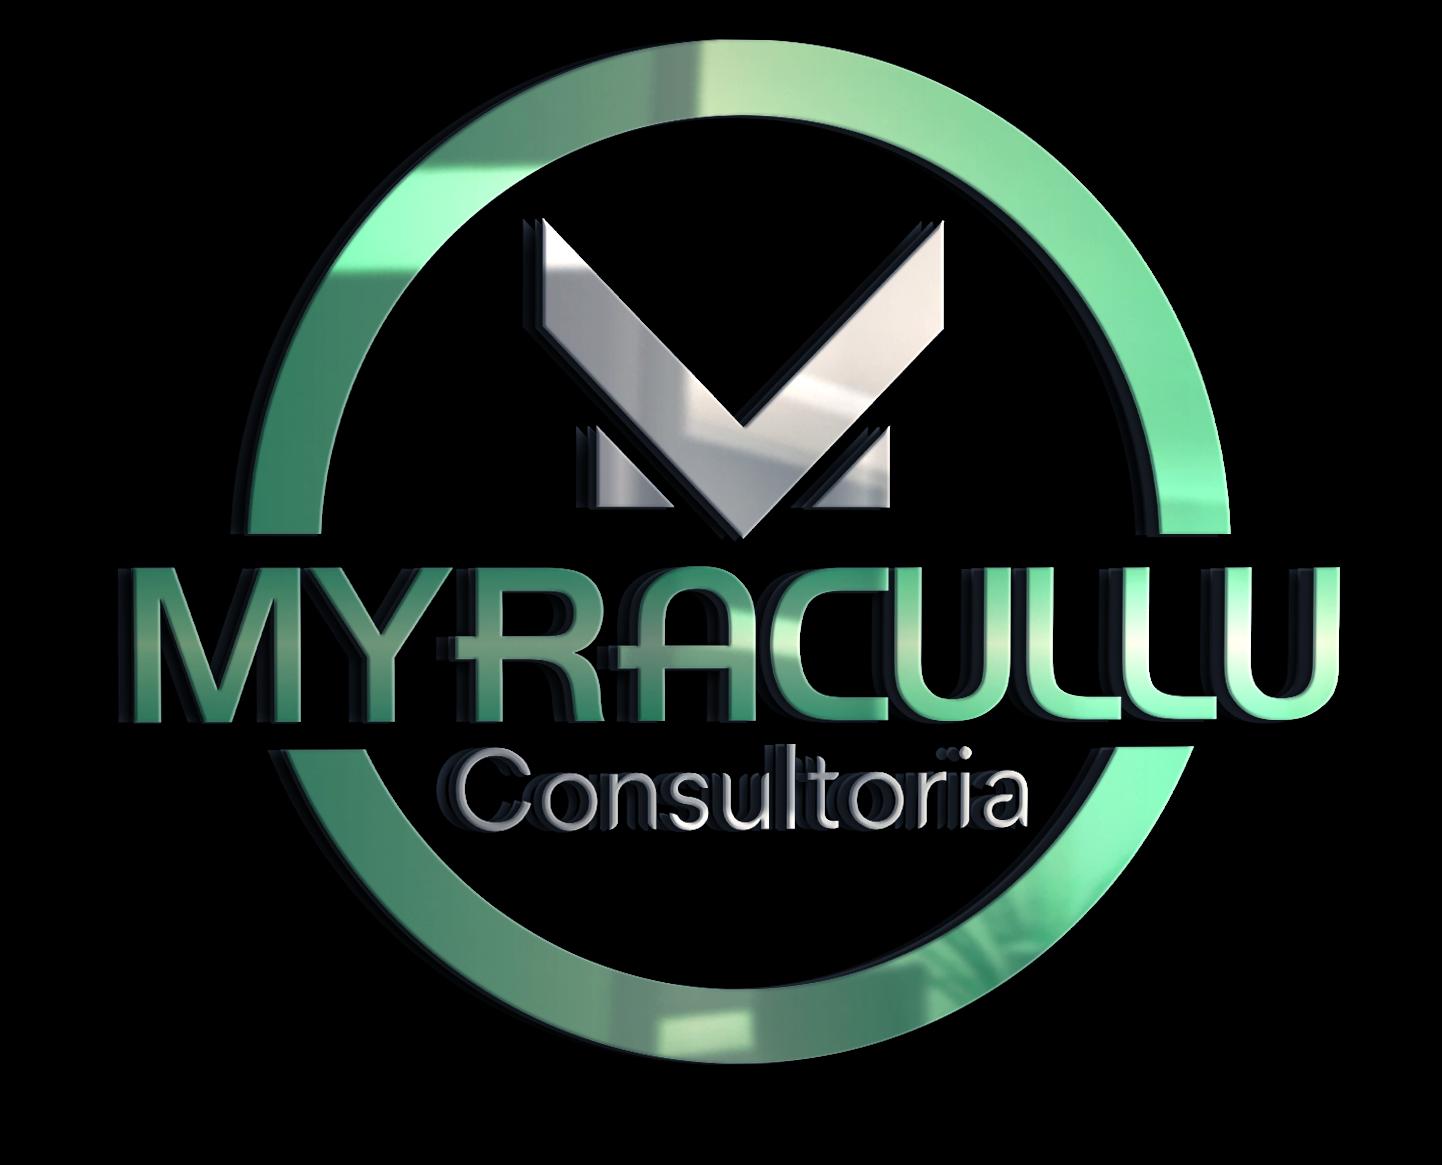 Myracullu